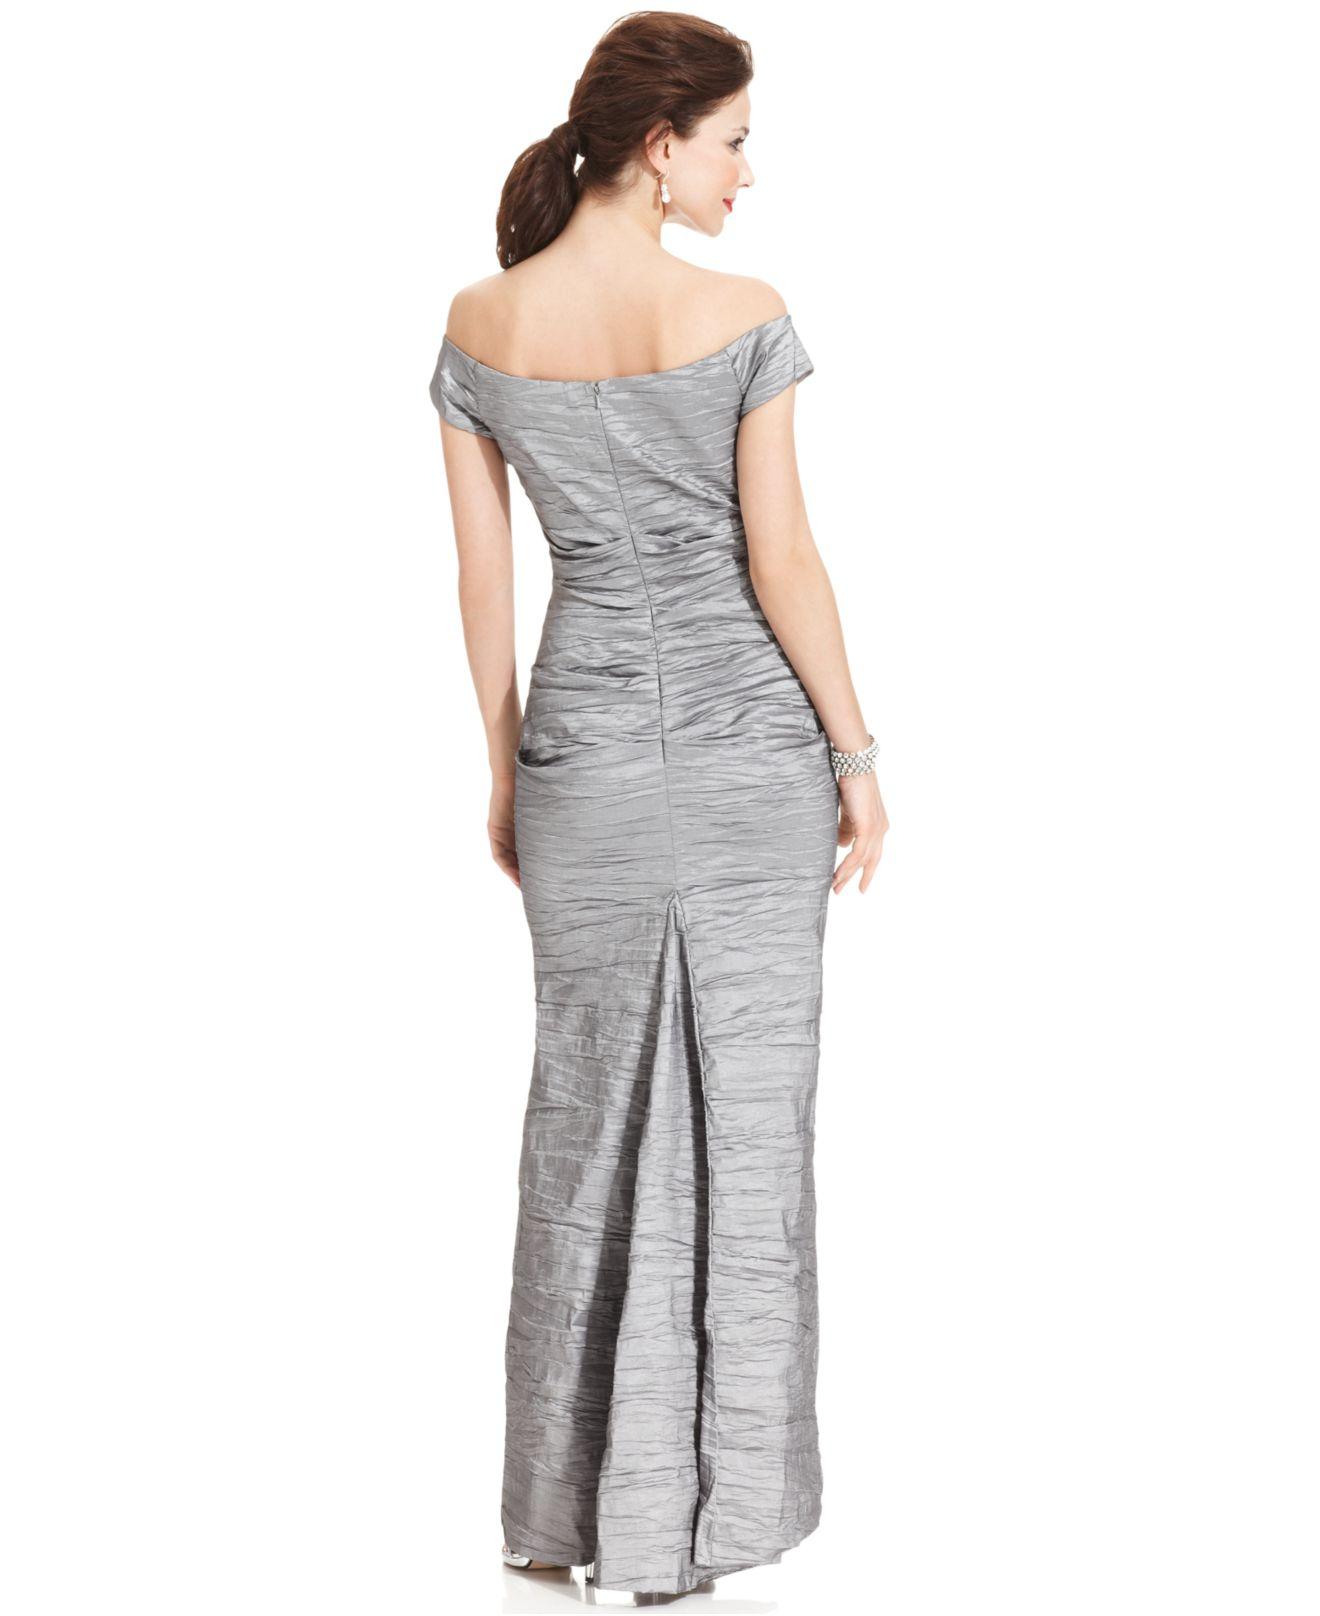 Lyst - Alex Evenings Off-the-shoulder Taffeta Evening Gown in Metallic